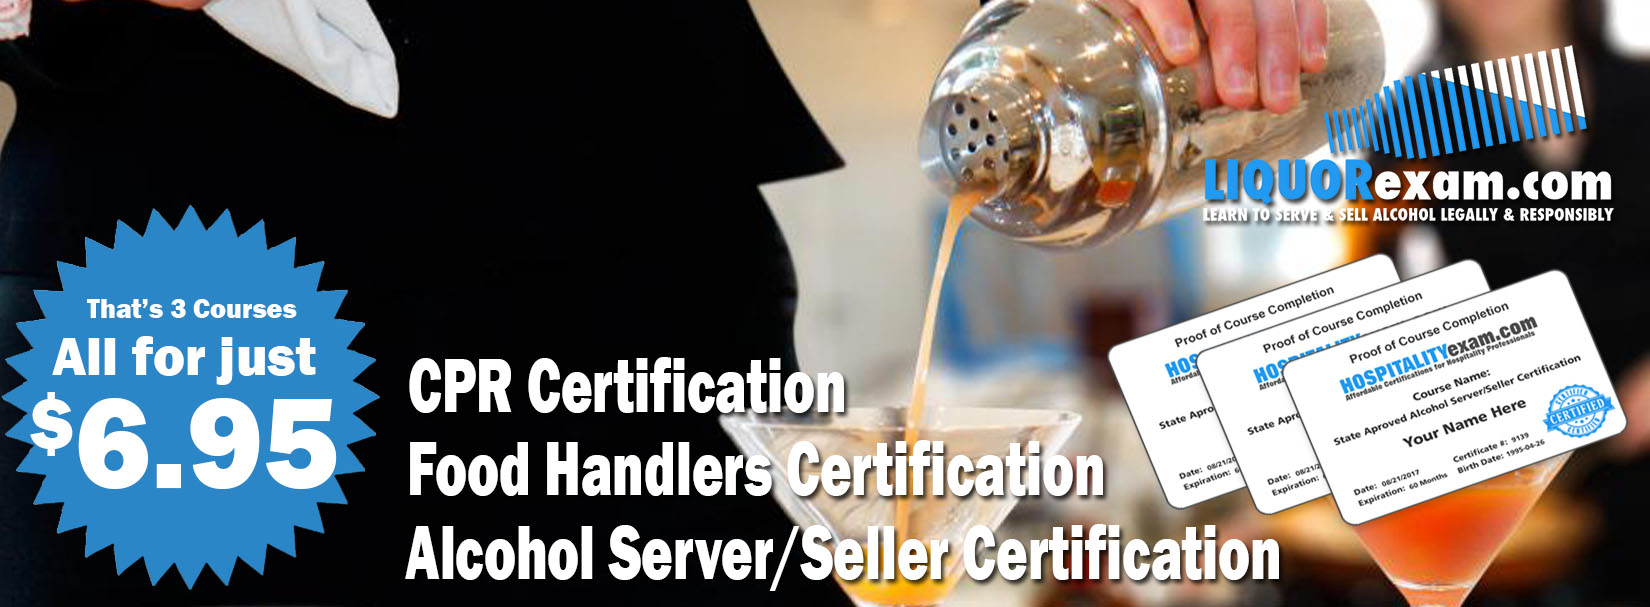 Liquorexam 795 Montana Alcohol Serverseller Certification